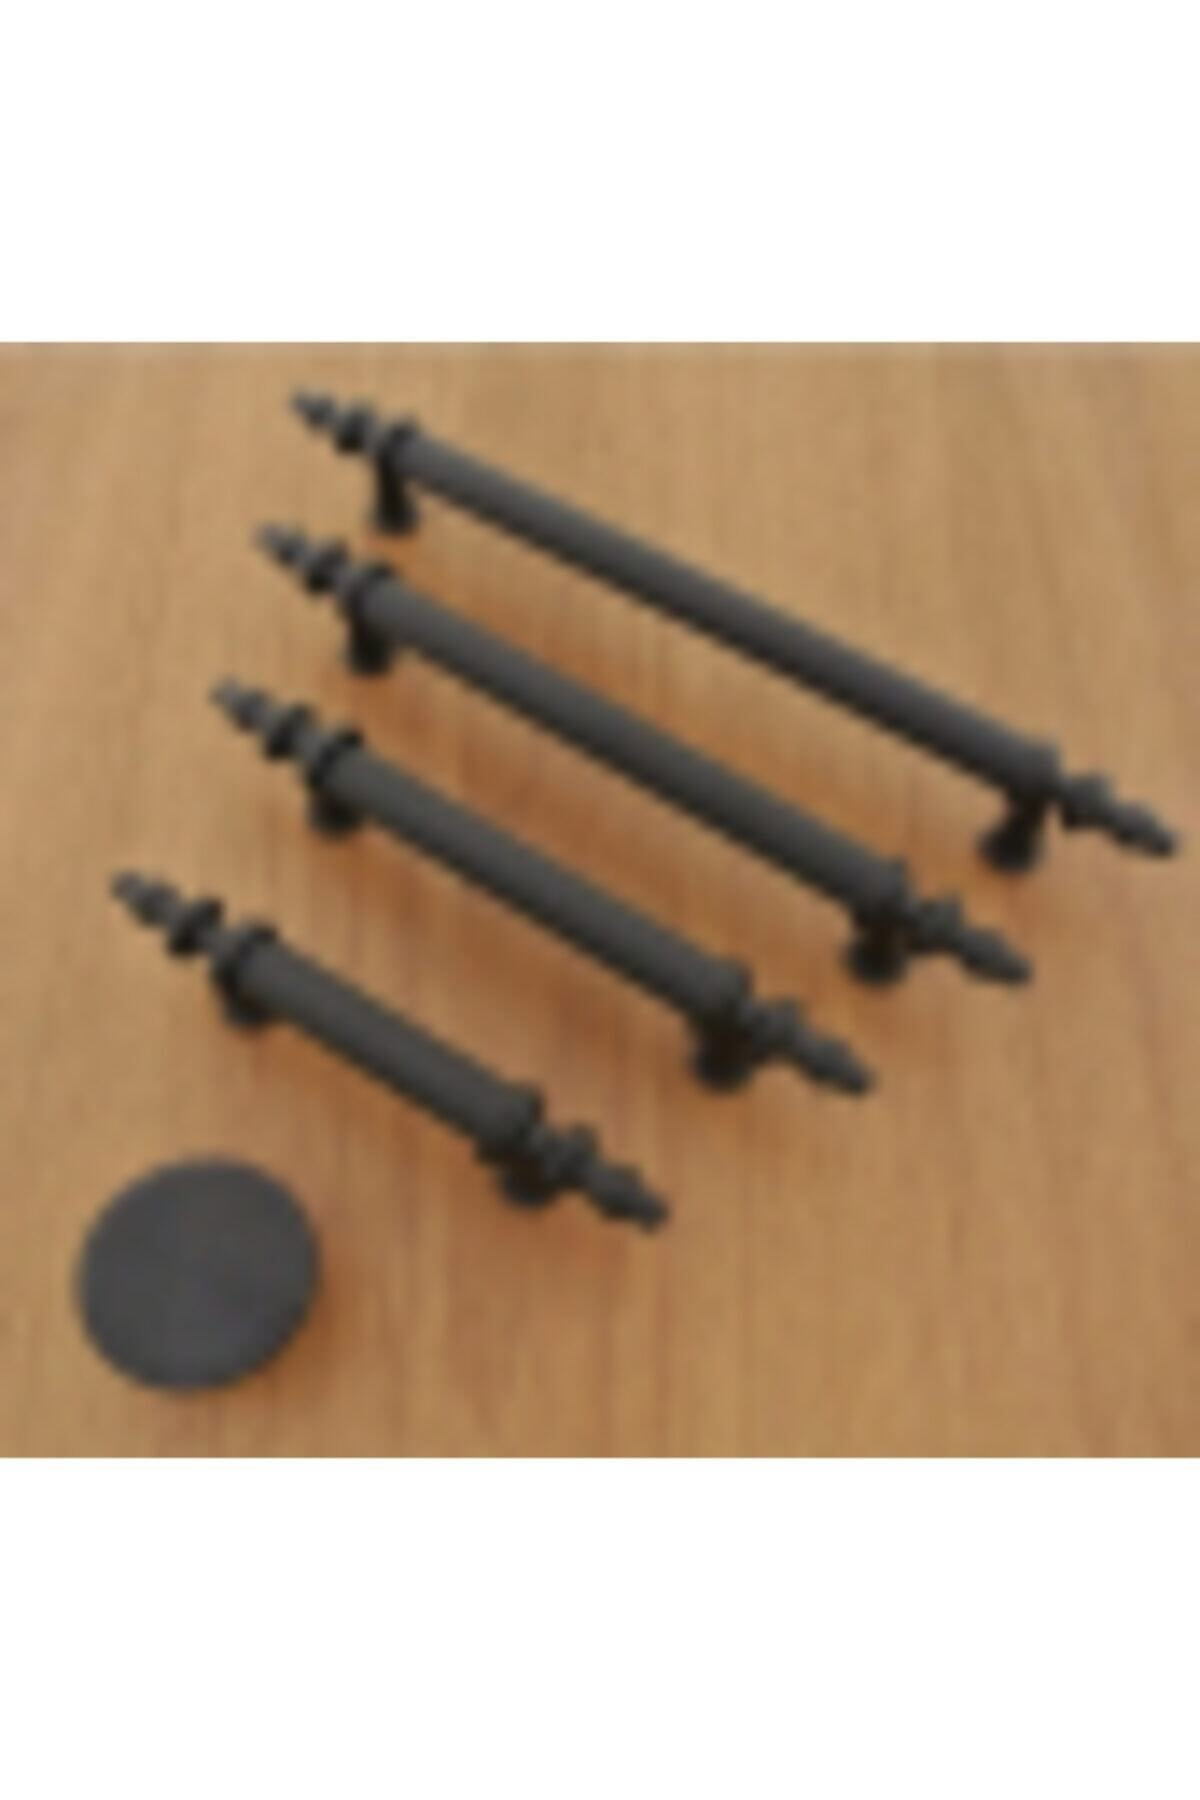 Azimkar Hırdavat Kumru Boy Kulp Mat Siyah 96 Mm Dolap Vestiyer